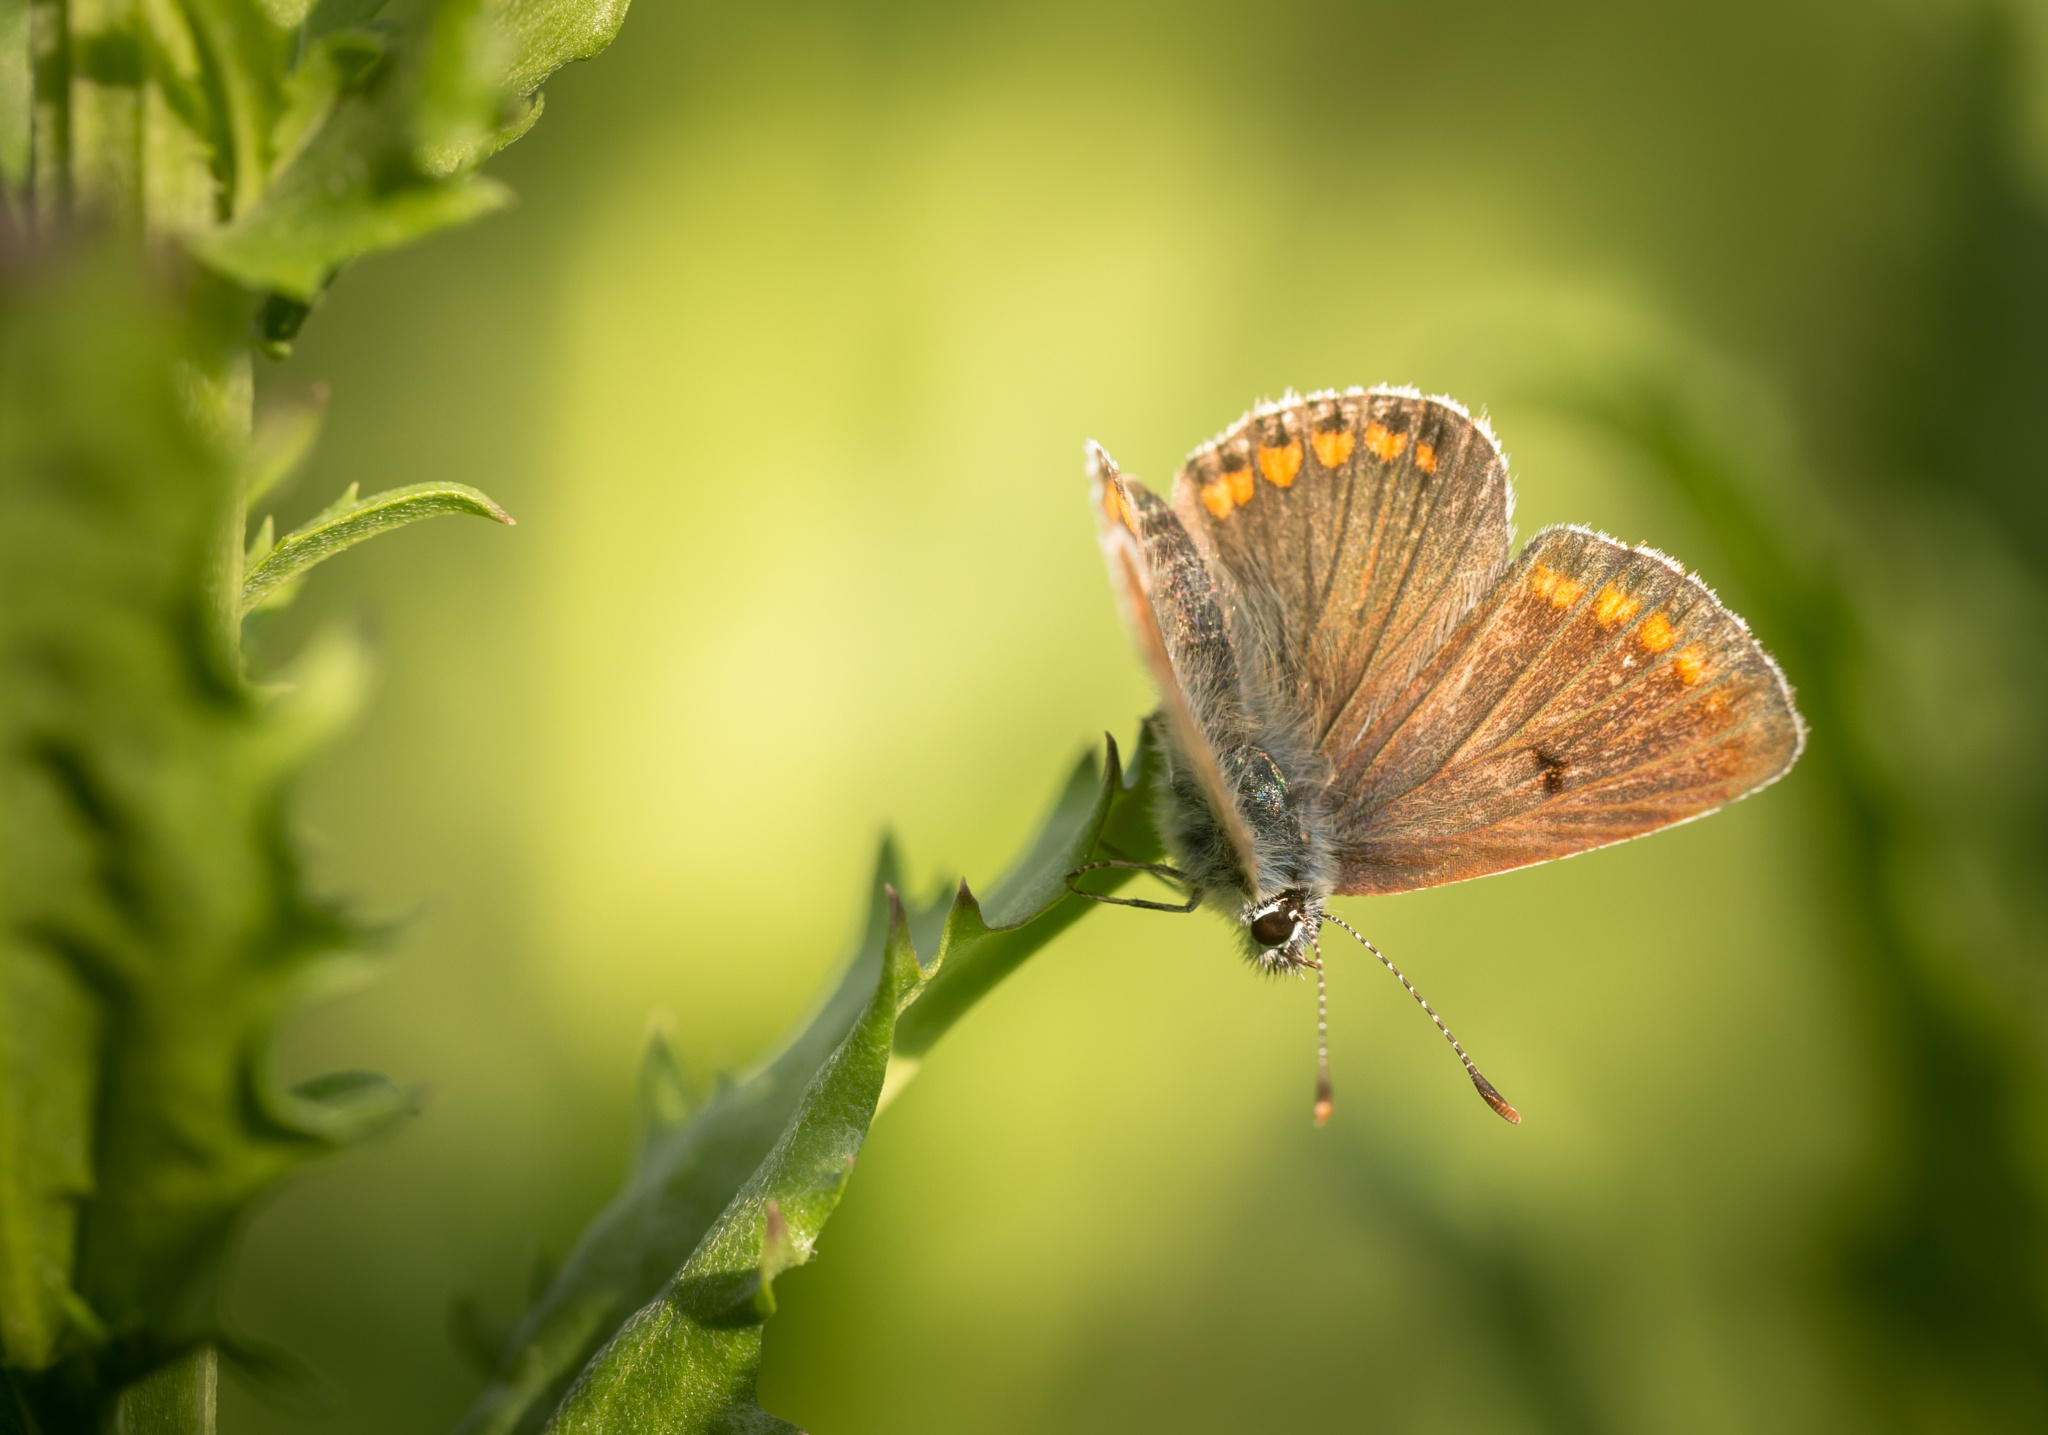 Butterfly by Anton Atanasov